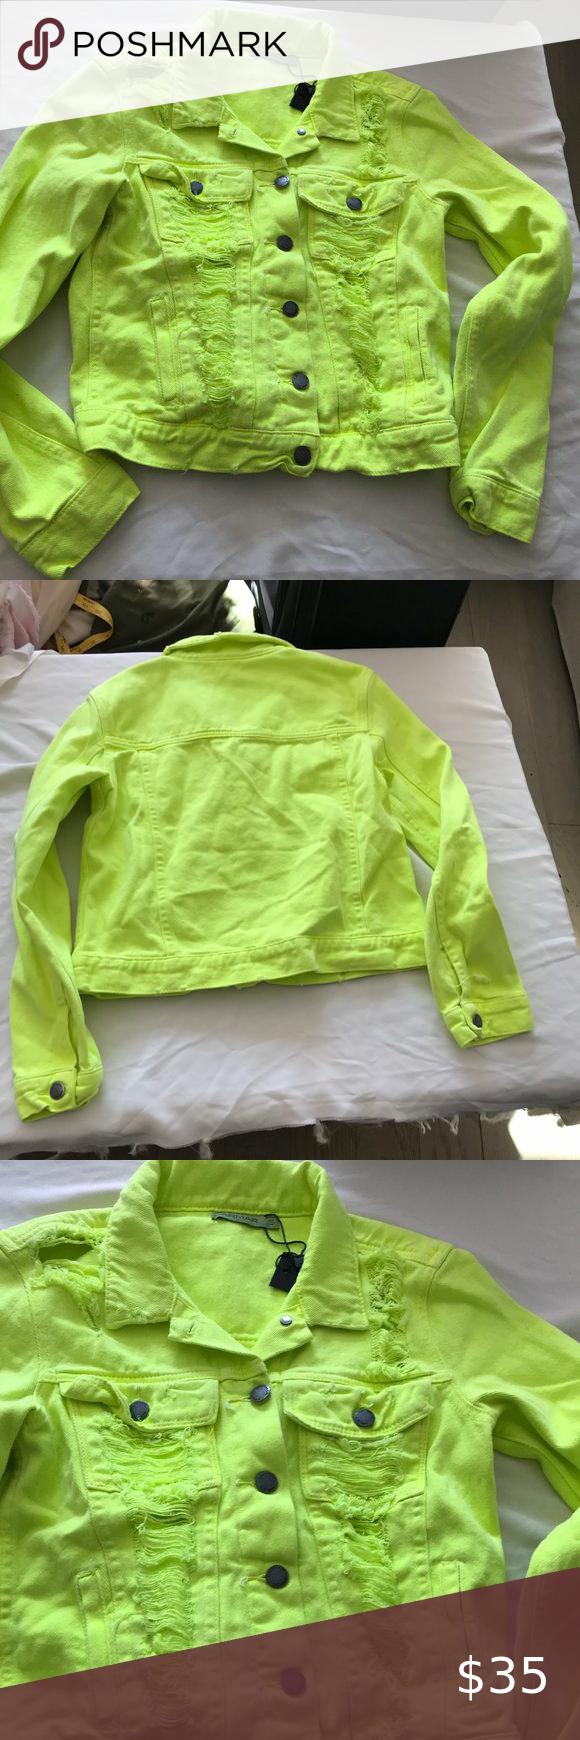 Carmar Lf Neon Lime Romeo Denim Jacket New S Destroyed Denim Jacket Destroyed Denim Denim Jacket [ 1740 x 580 Pixel ]